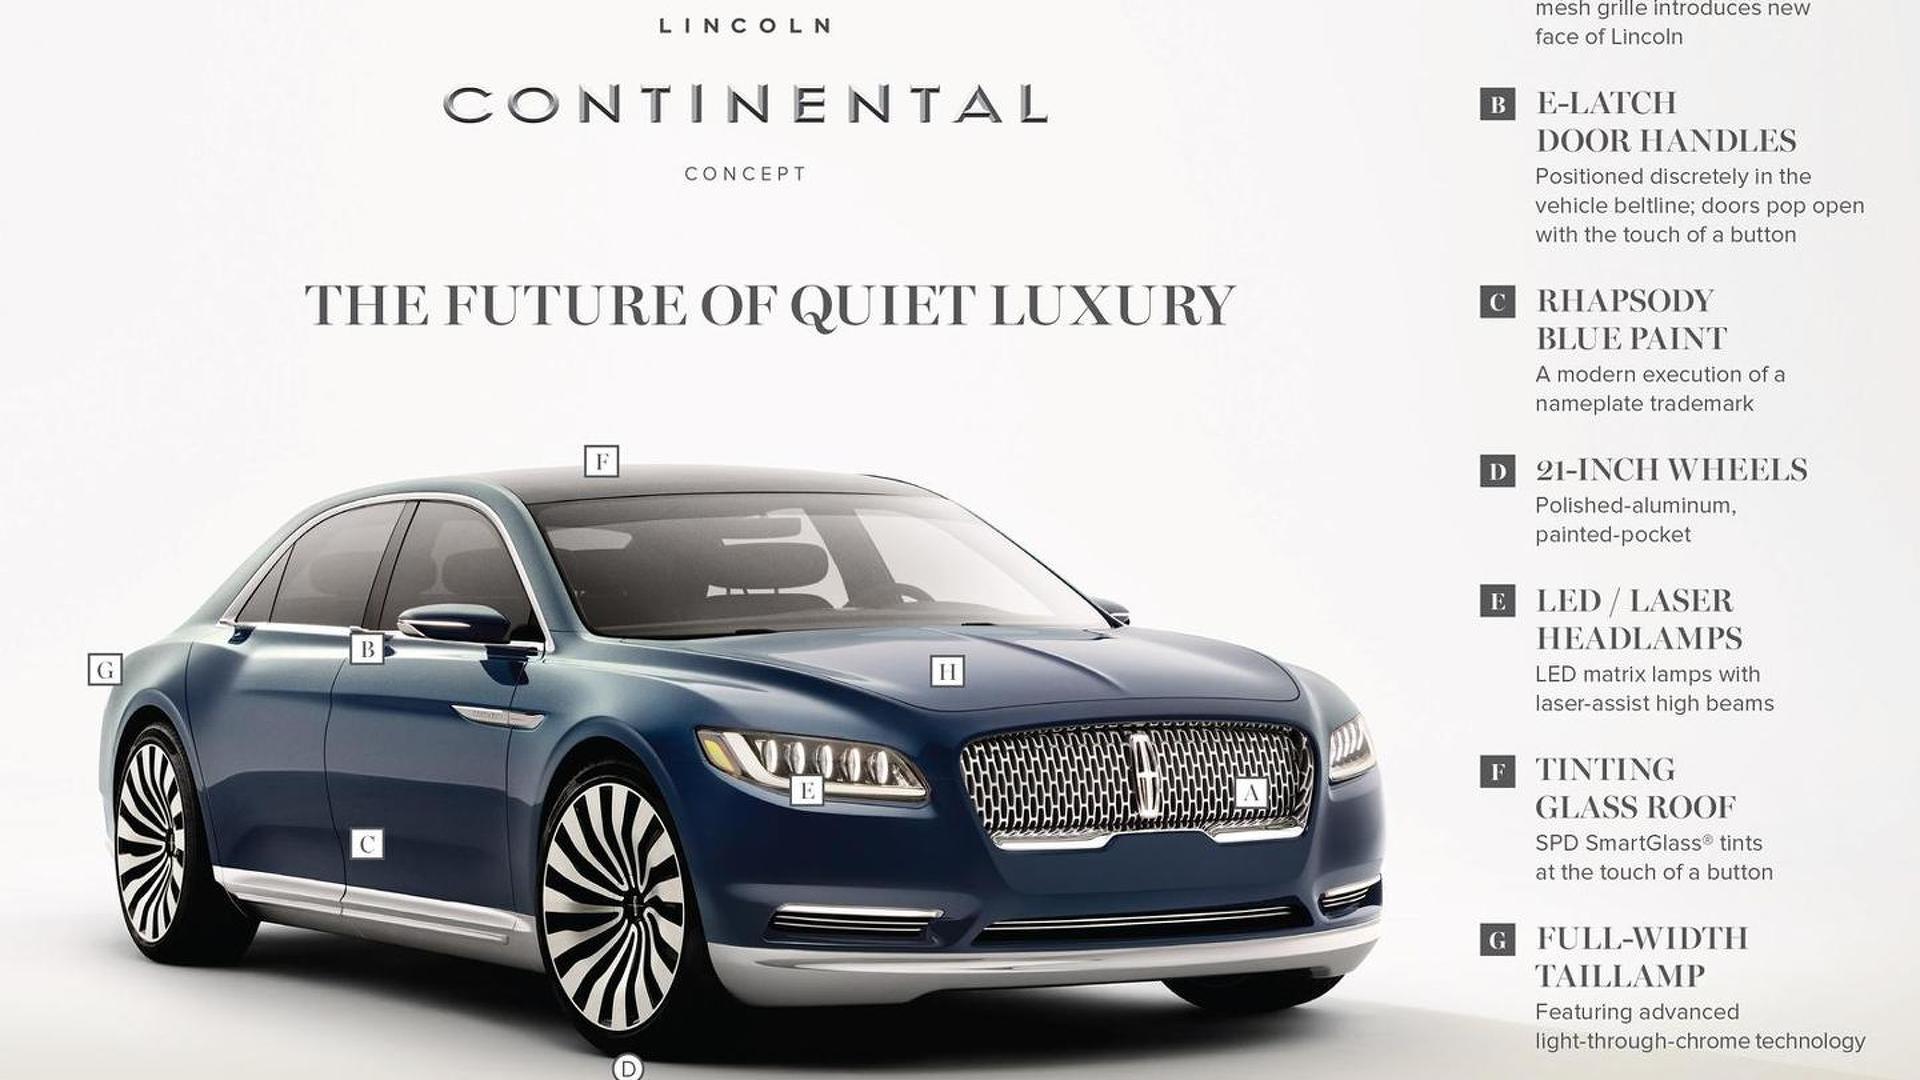 2015 Lincoln Continental concept breaks cover [videos]